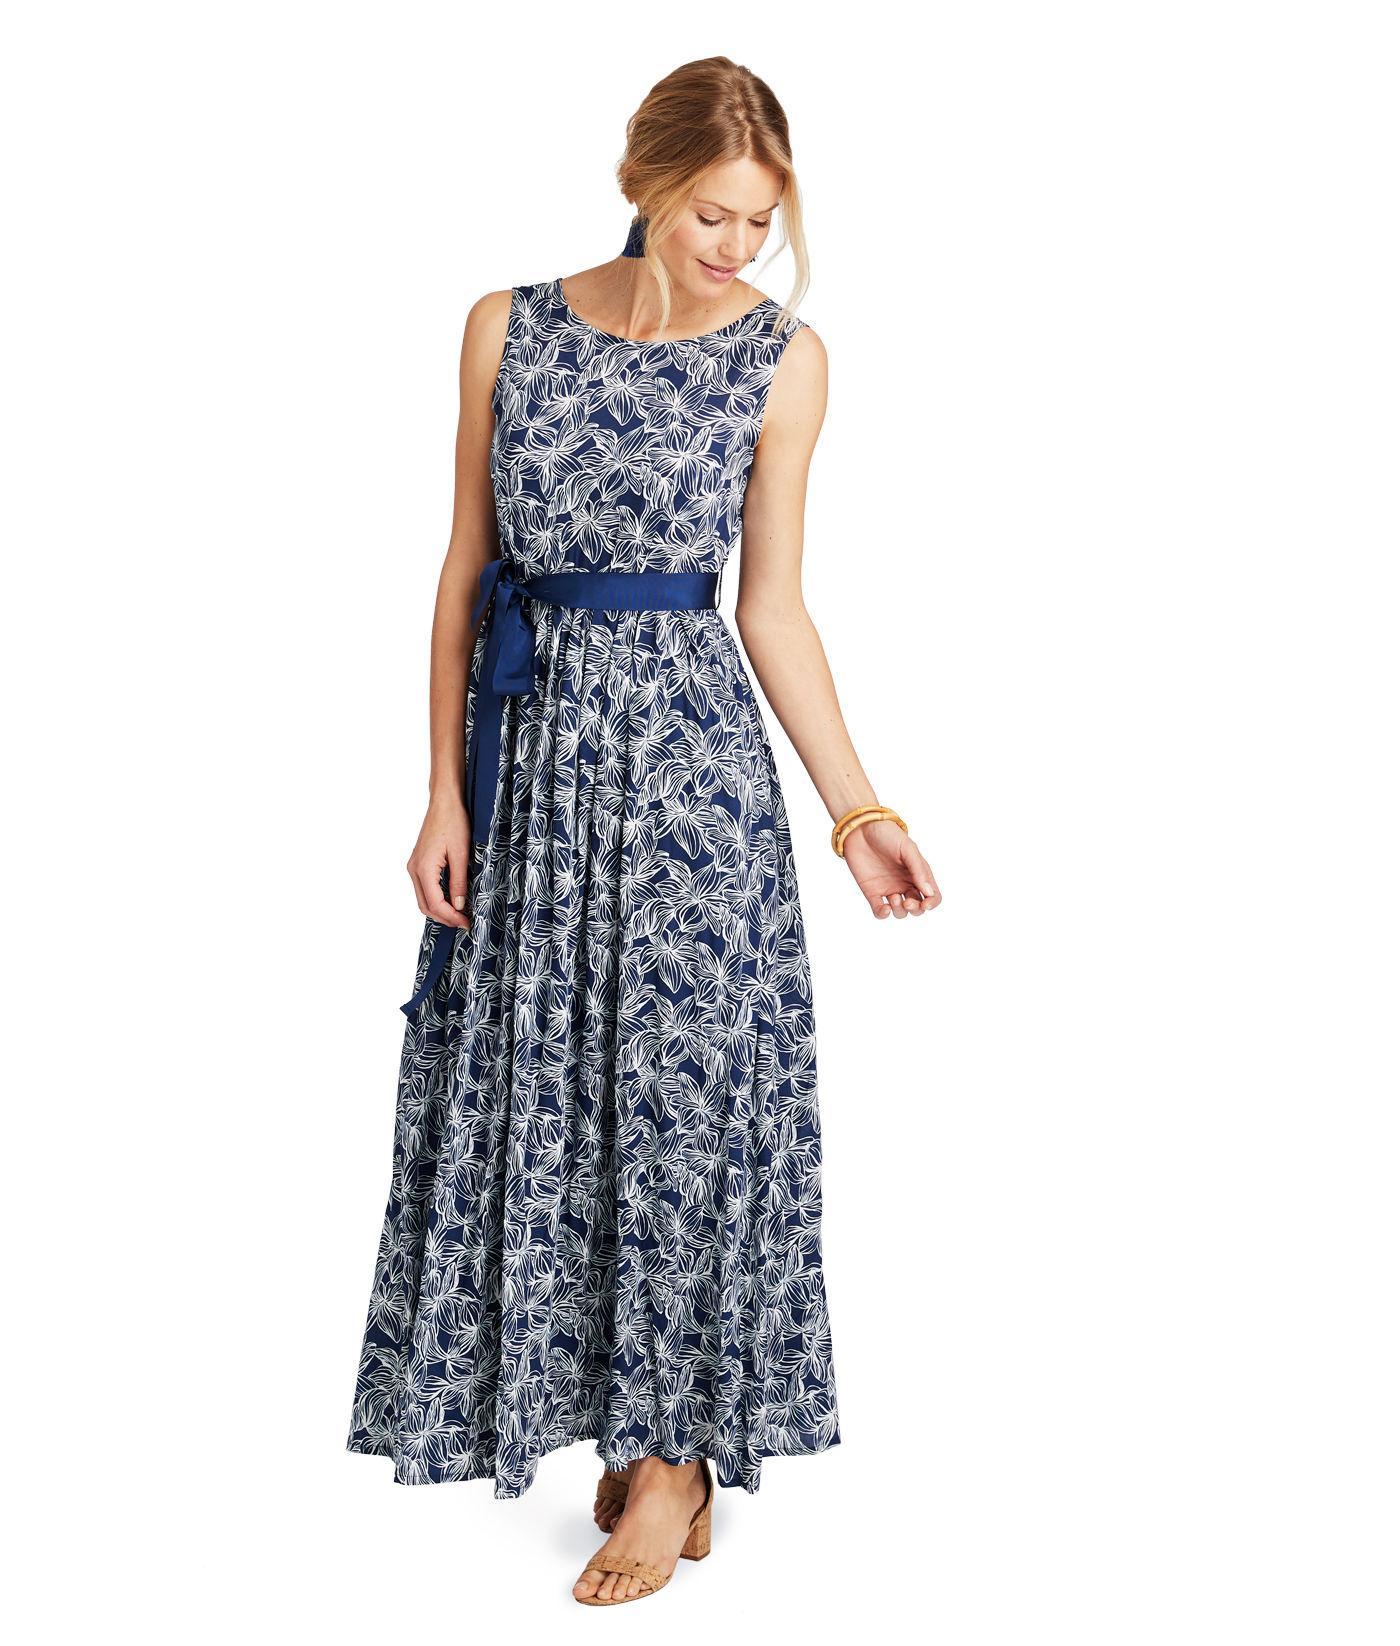 829abf7c7c Vineyard Vines Plumeria Print Maxi Dress in Blue - Save 53% - Lyst